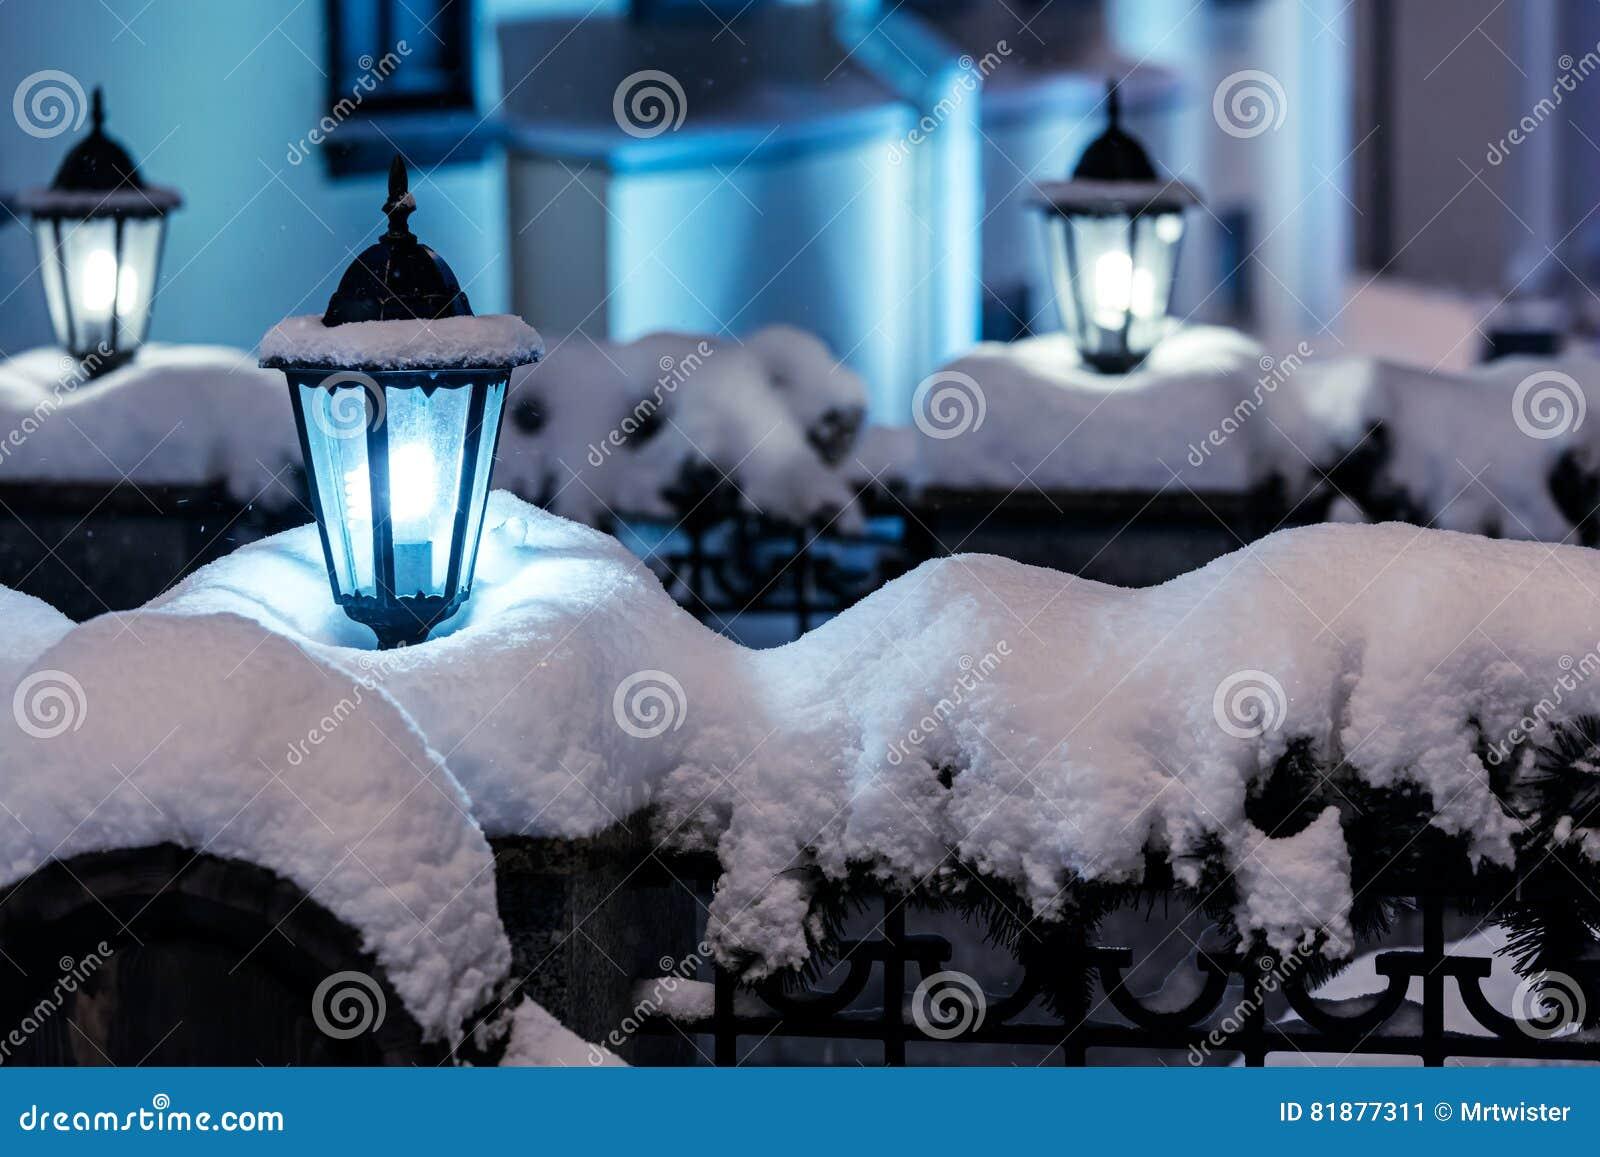 City Night Scene With Street Christmas Lights During Snowfall Stock ...